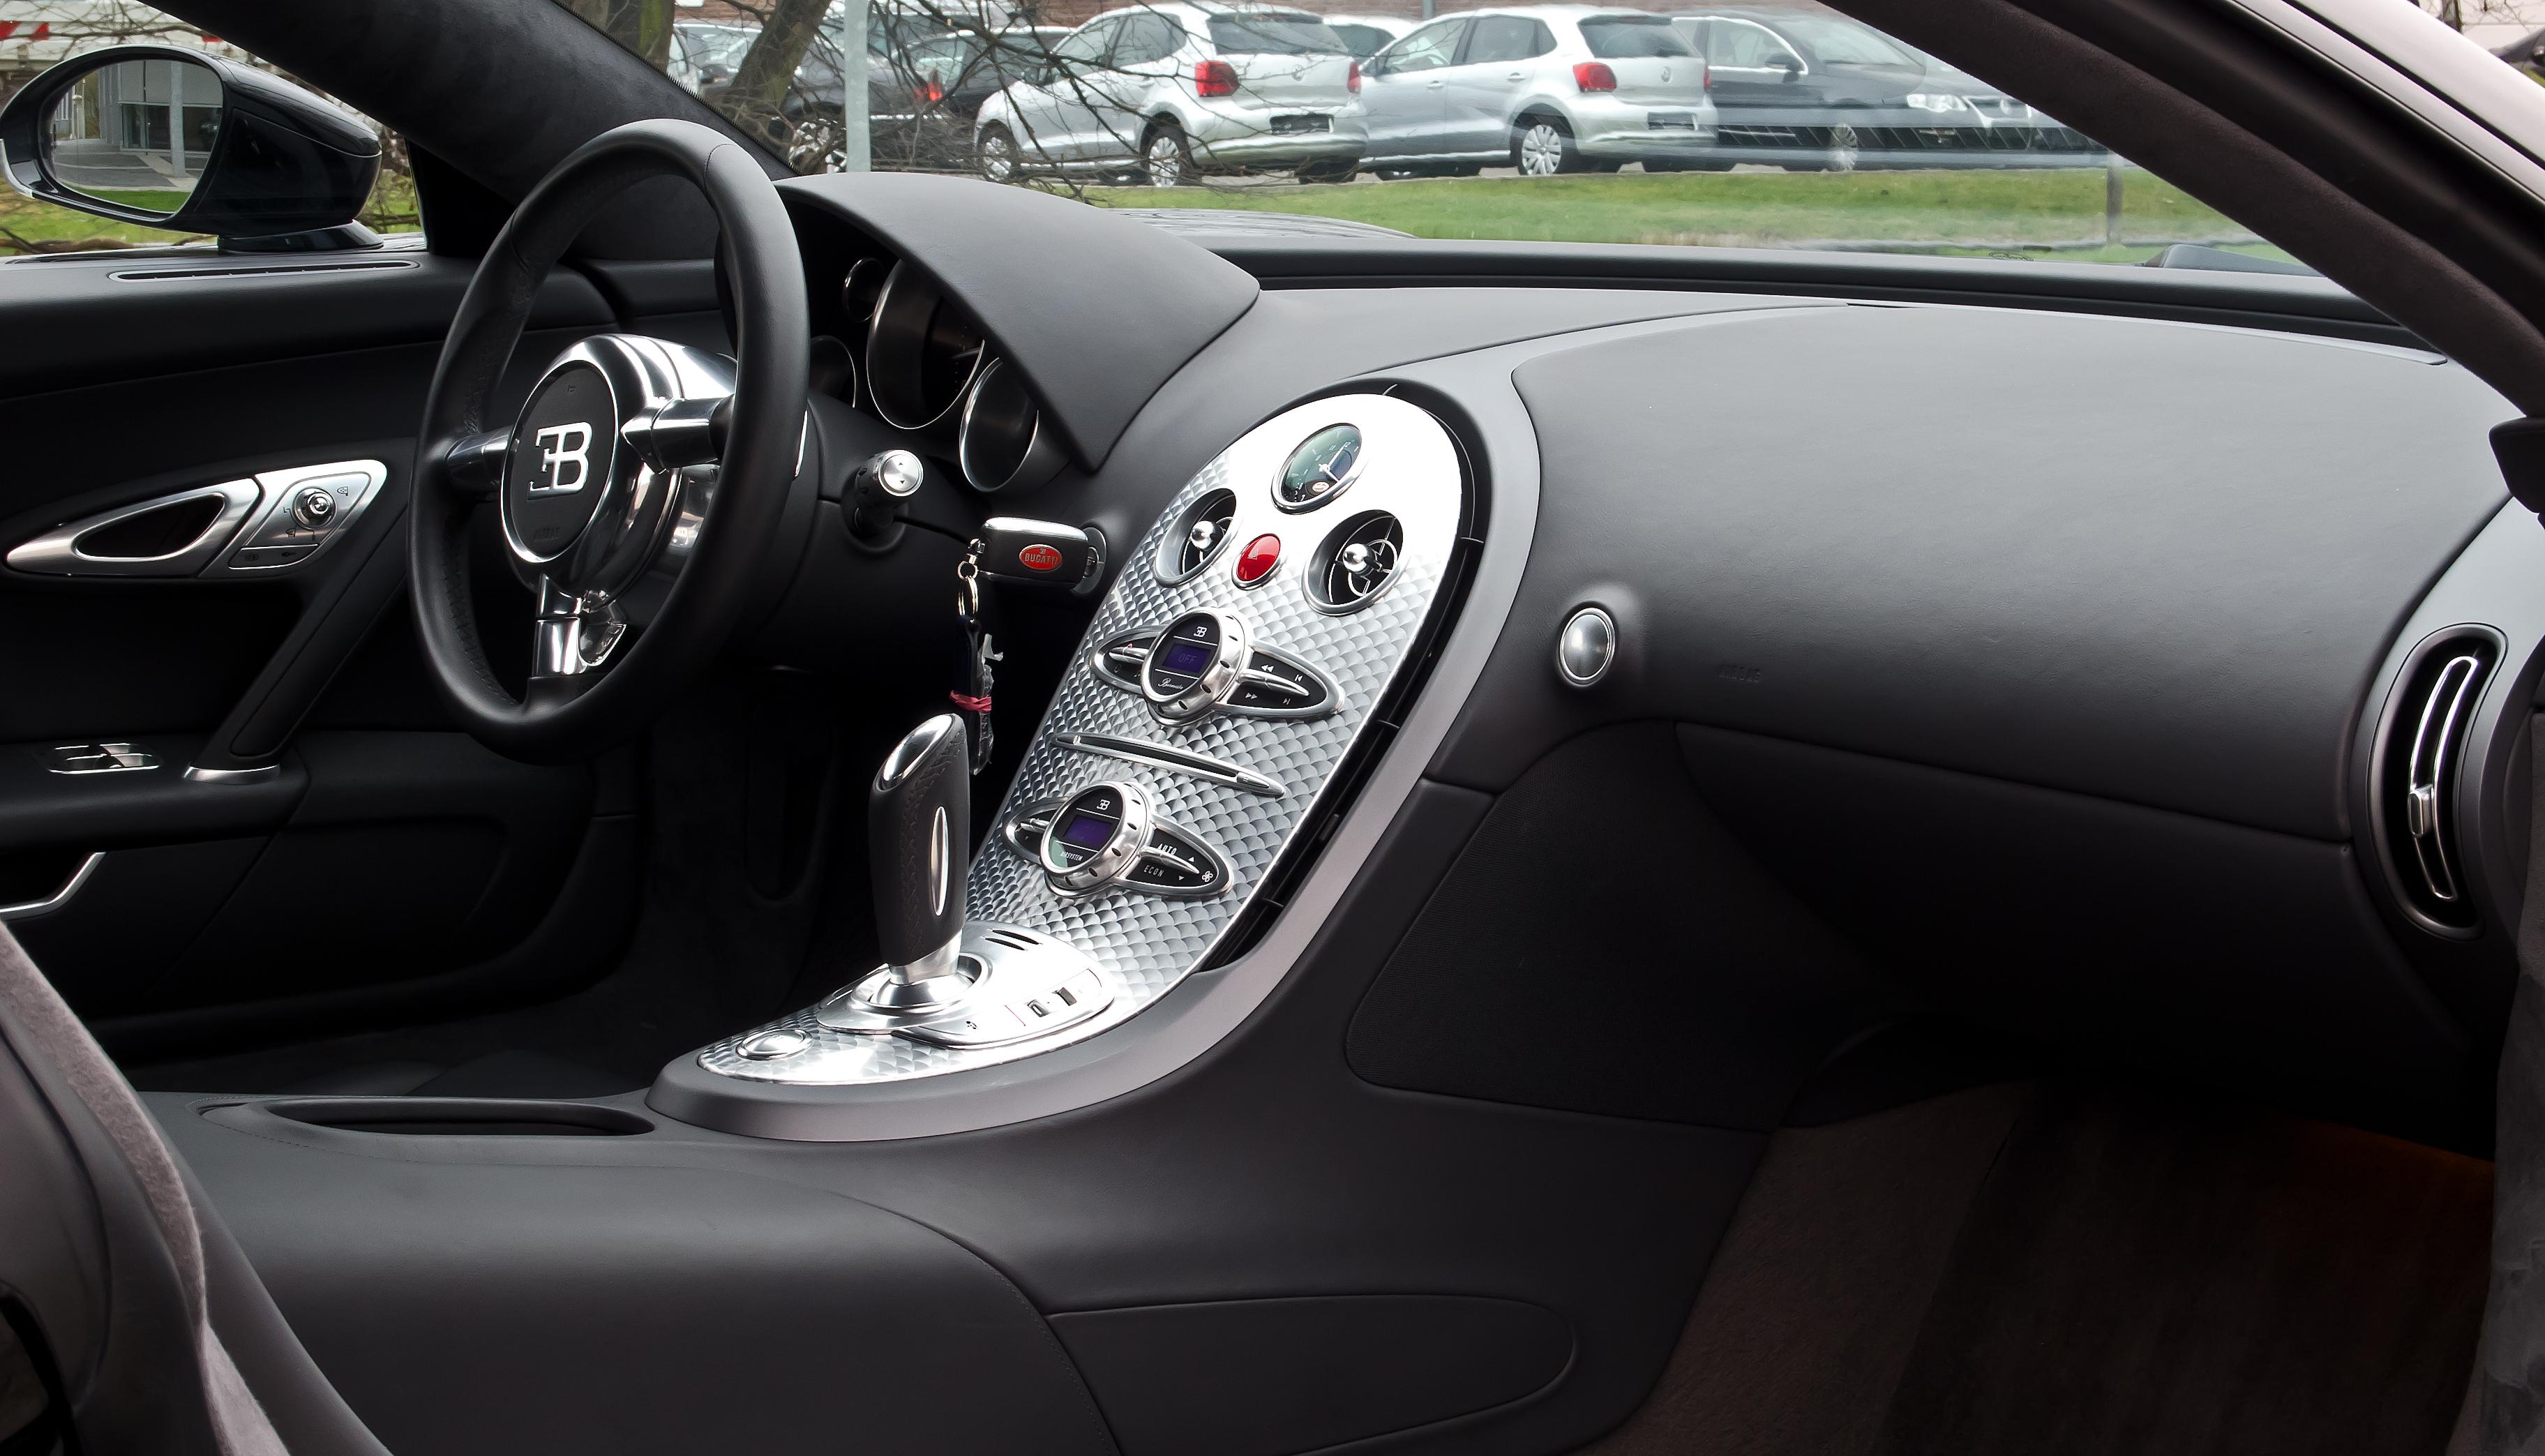 file bugatti veyron 16 4 innenraum 5 april 2012 d wikimedia commons. Black Bedroom Furniture Sets. Home Design Ideas